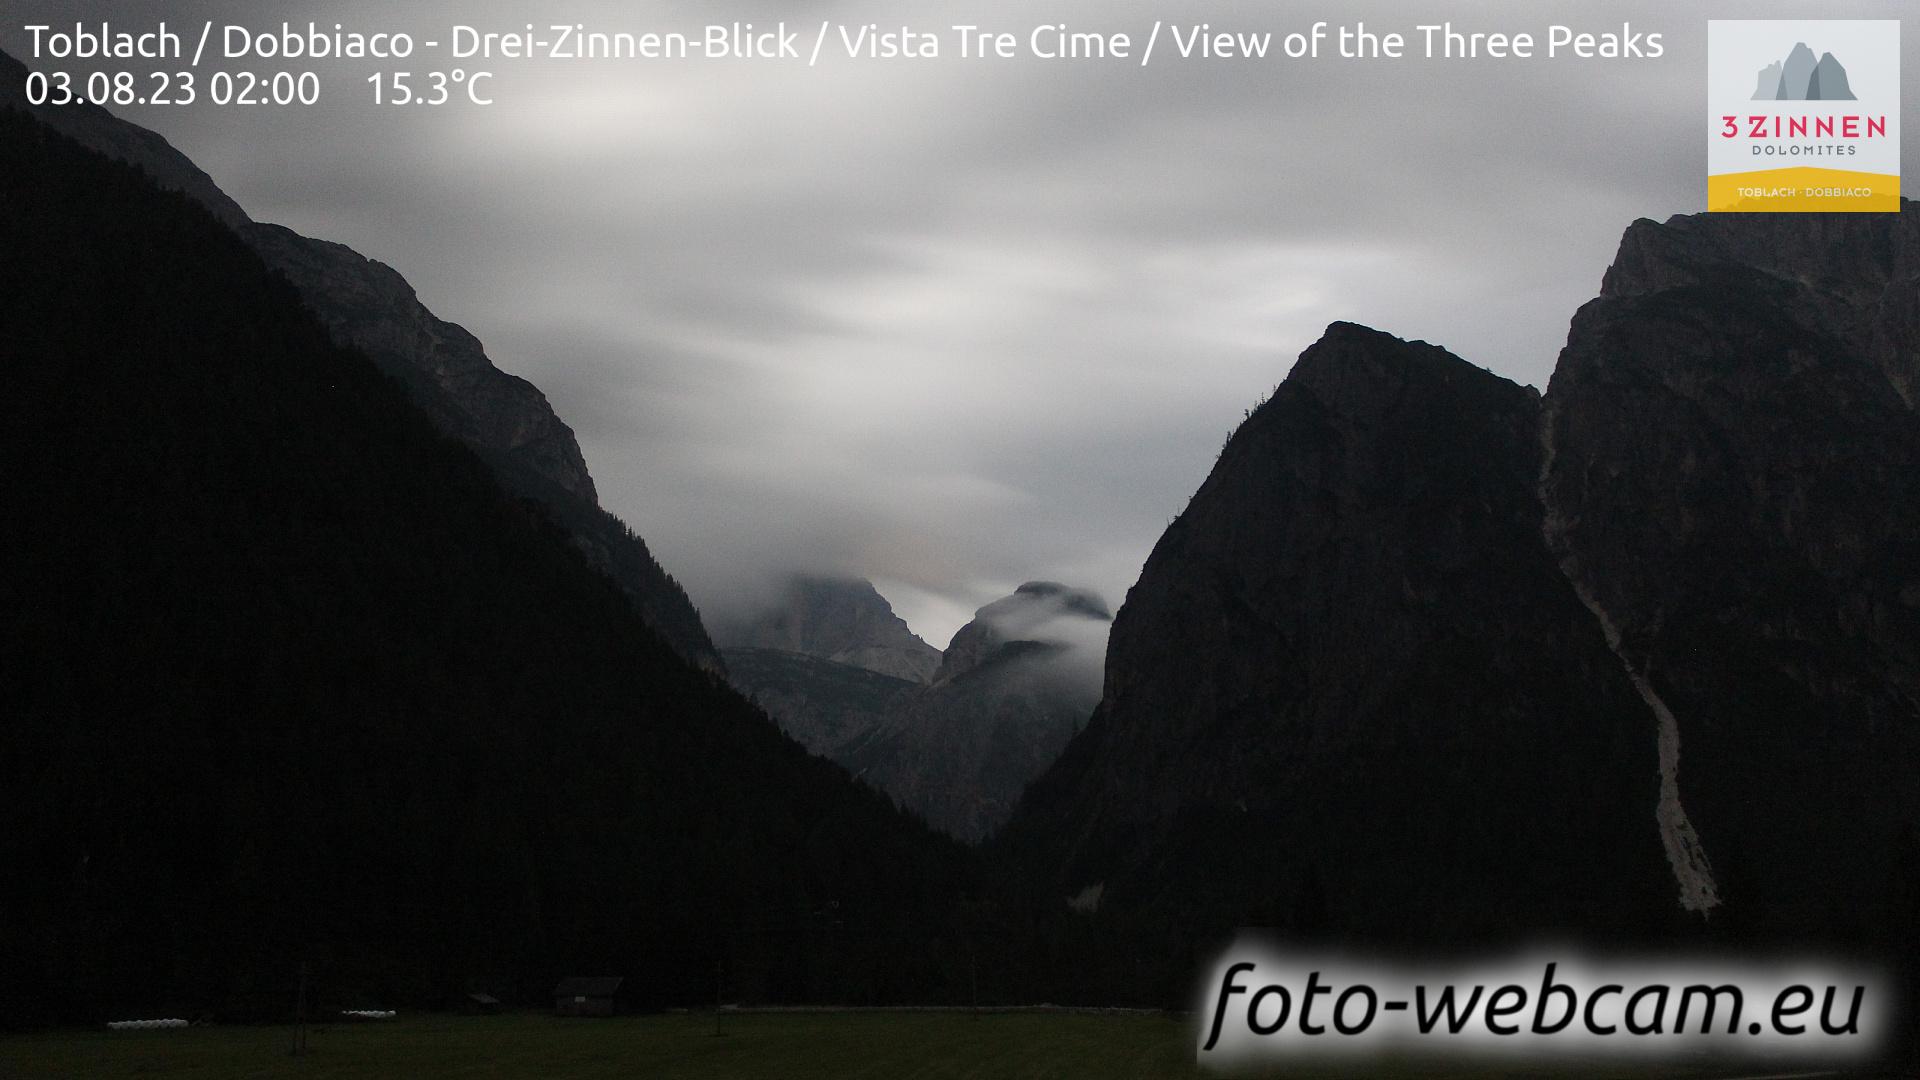 Toblach (Dolomites) Tue. 02:27